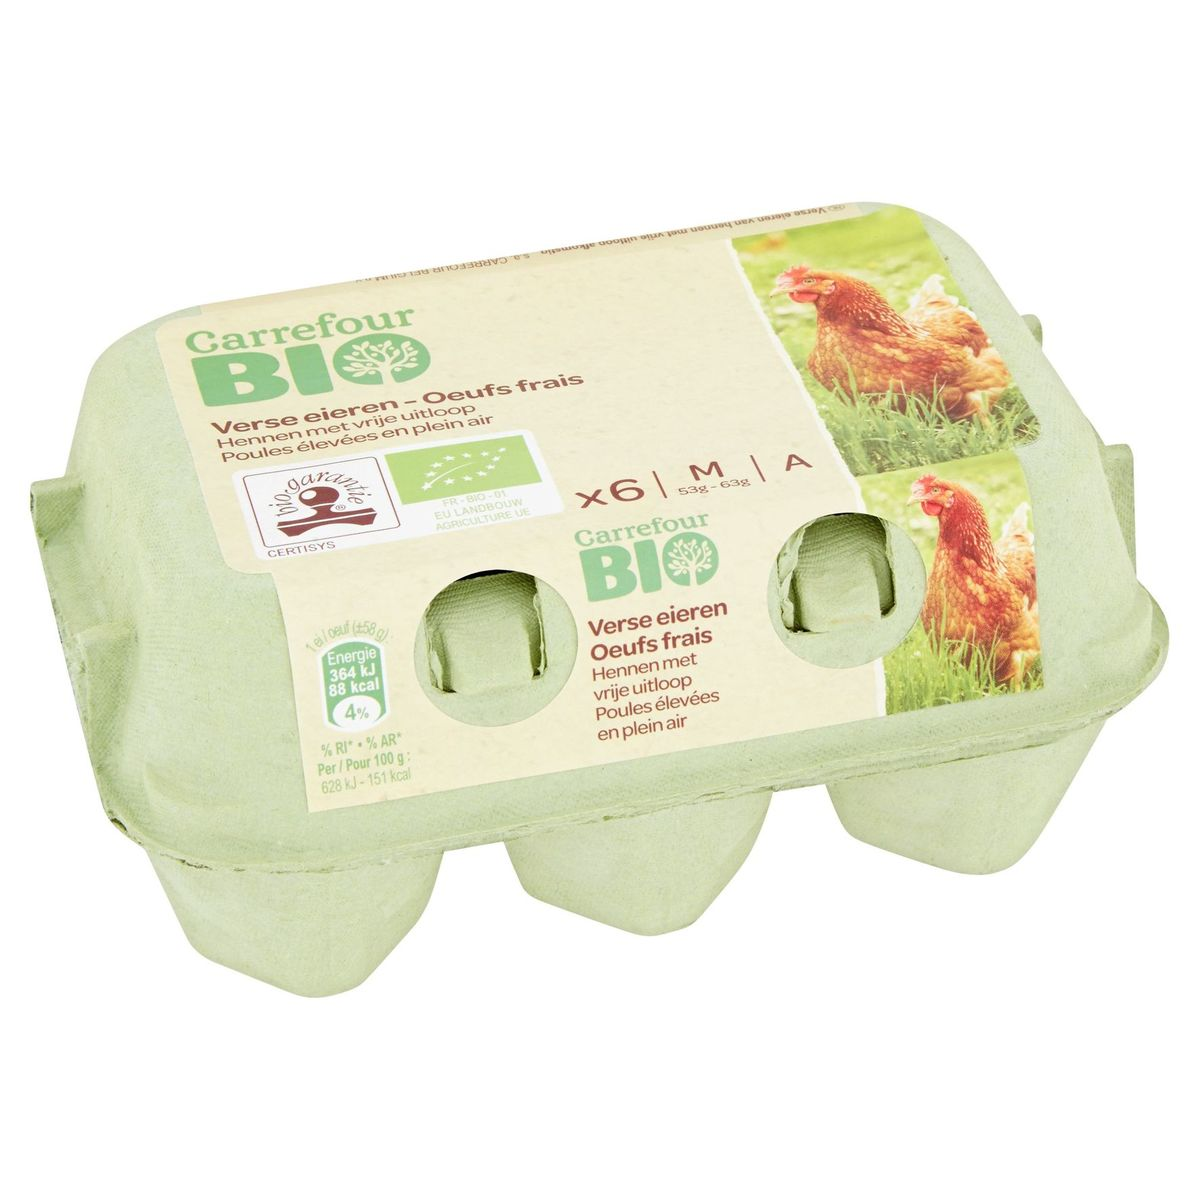 Carrefour Bio 6 Verse Eieren M